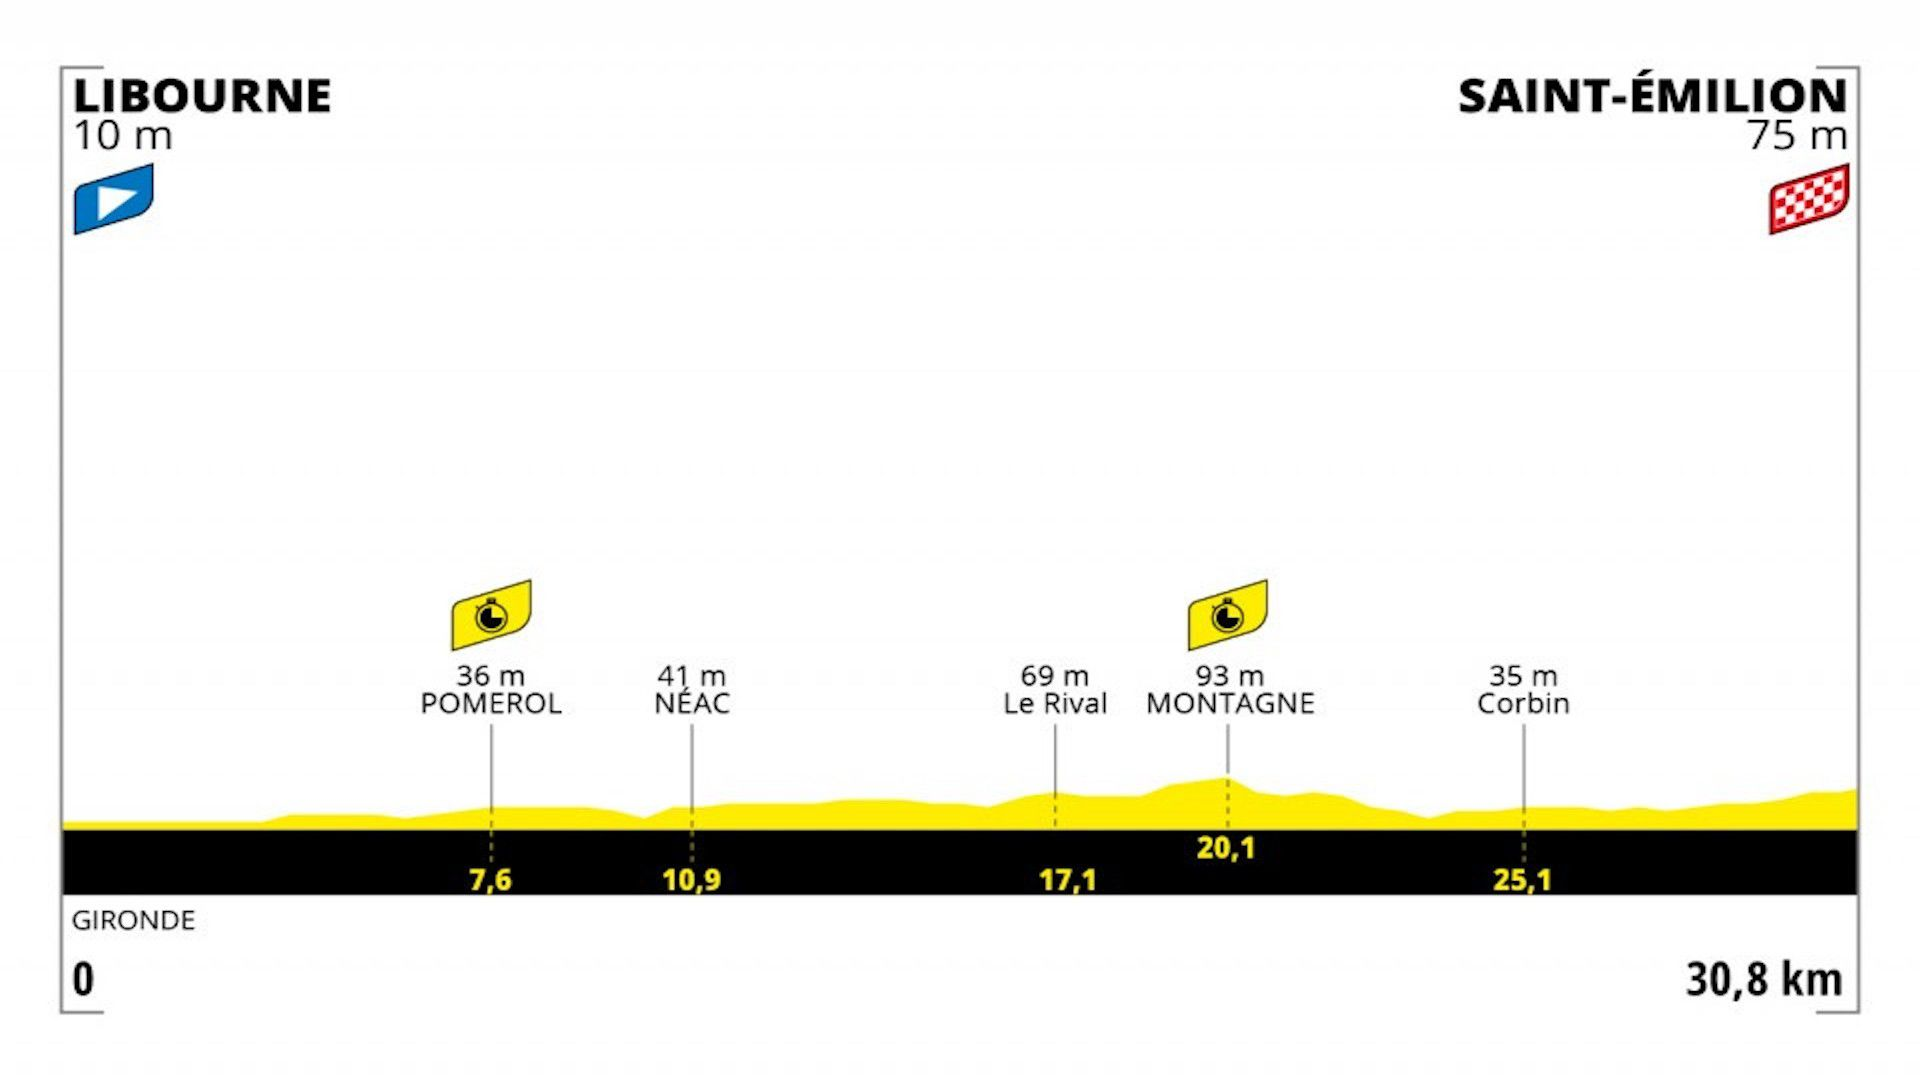 Etapa 20 - Contrarreloj individual, le Tour de France 2021